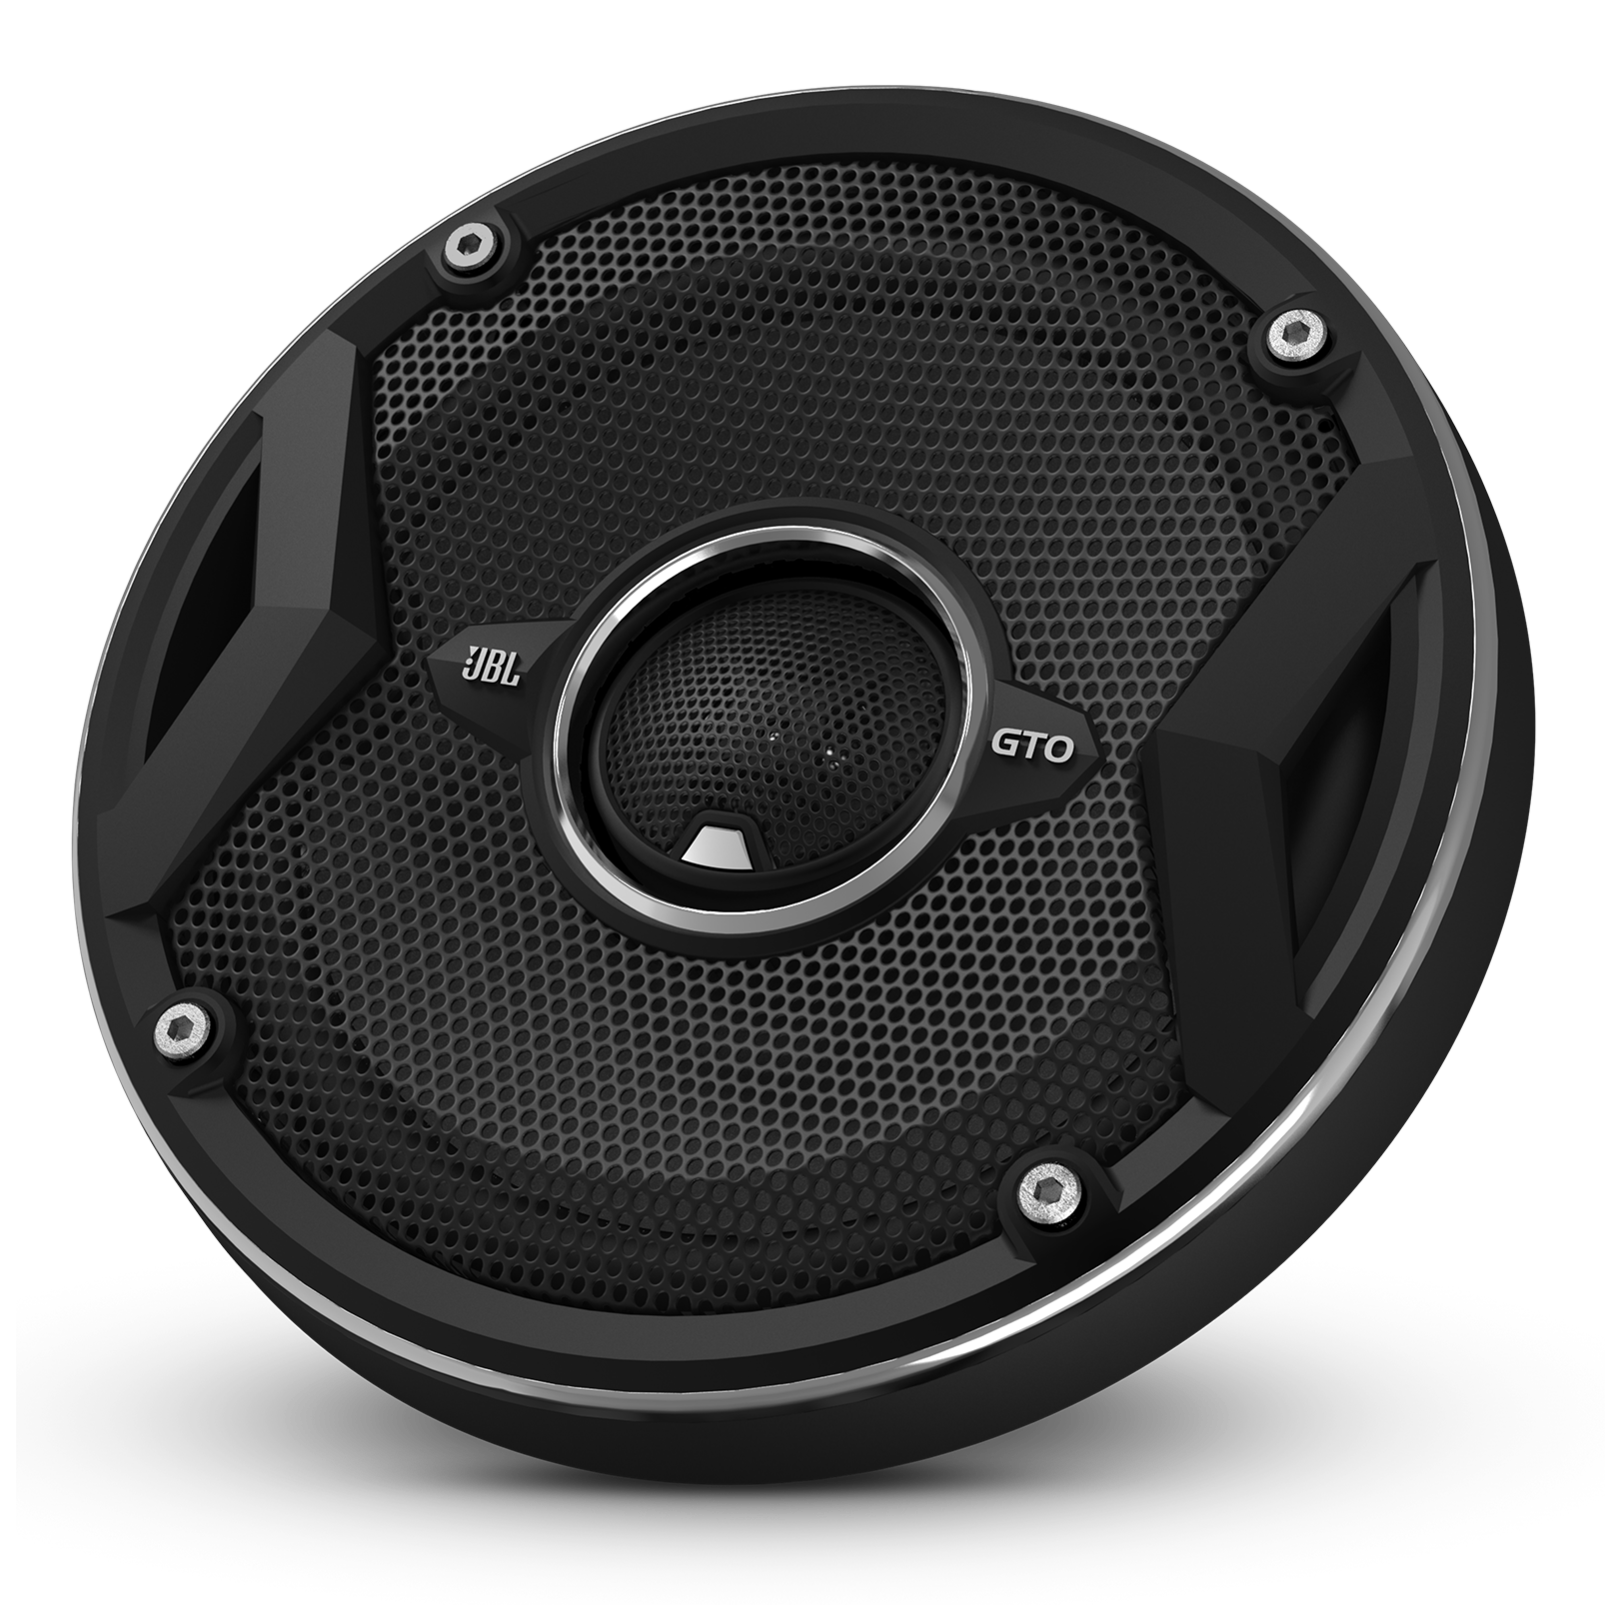 Gto629 180 Watt Two Way 5 X 7 Speaker System 1993 Nissan Pathfinder Wiring